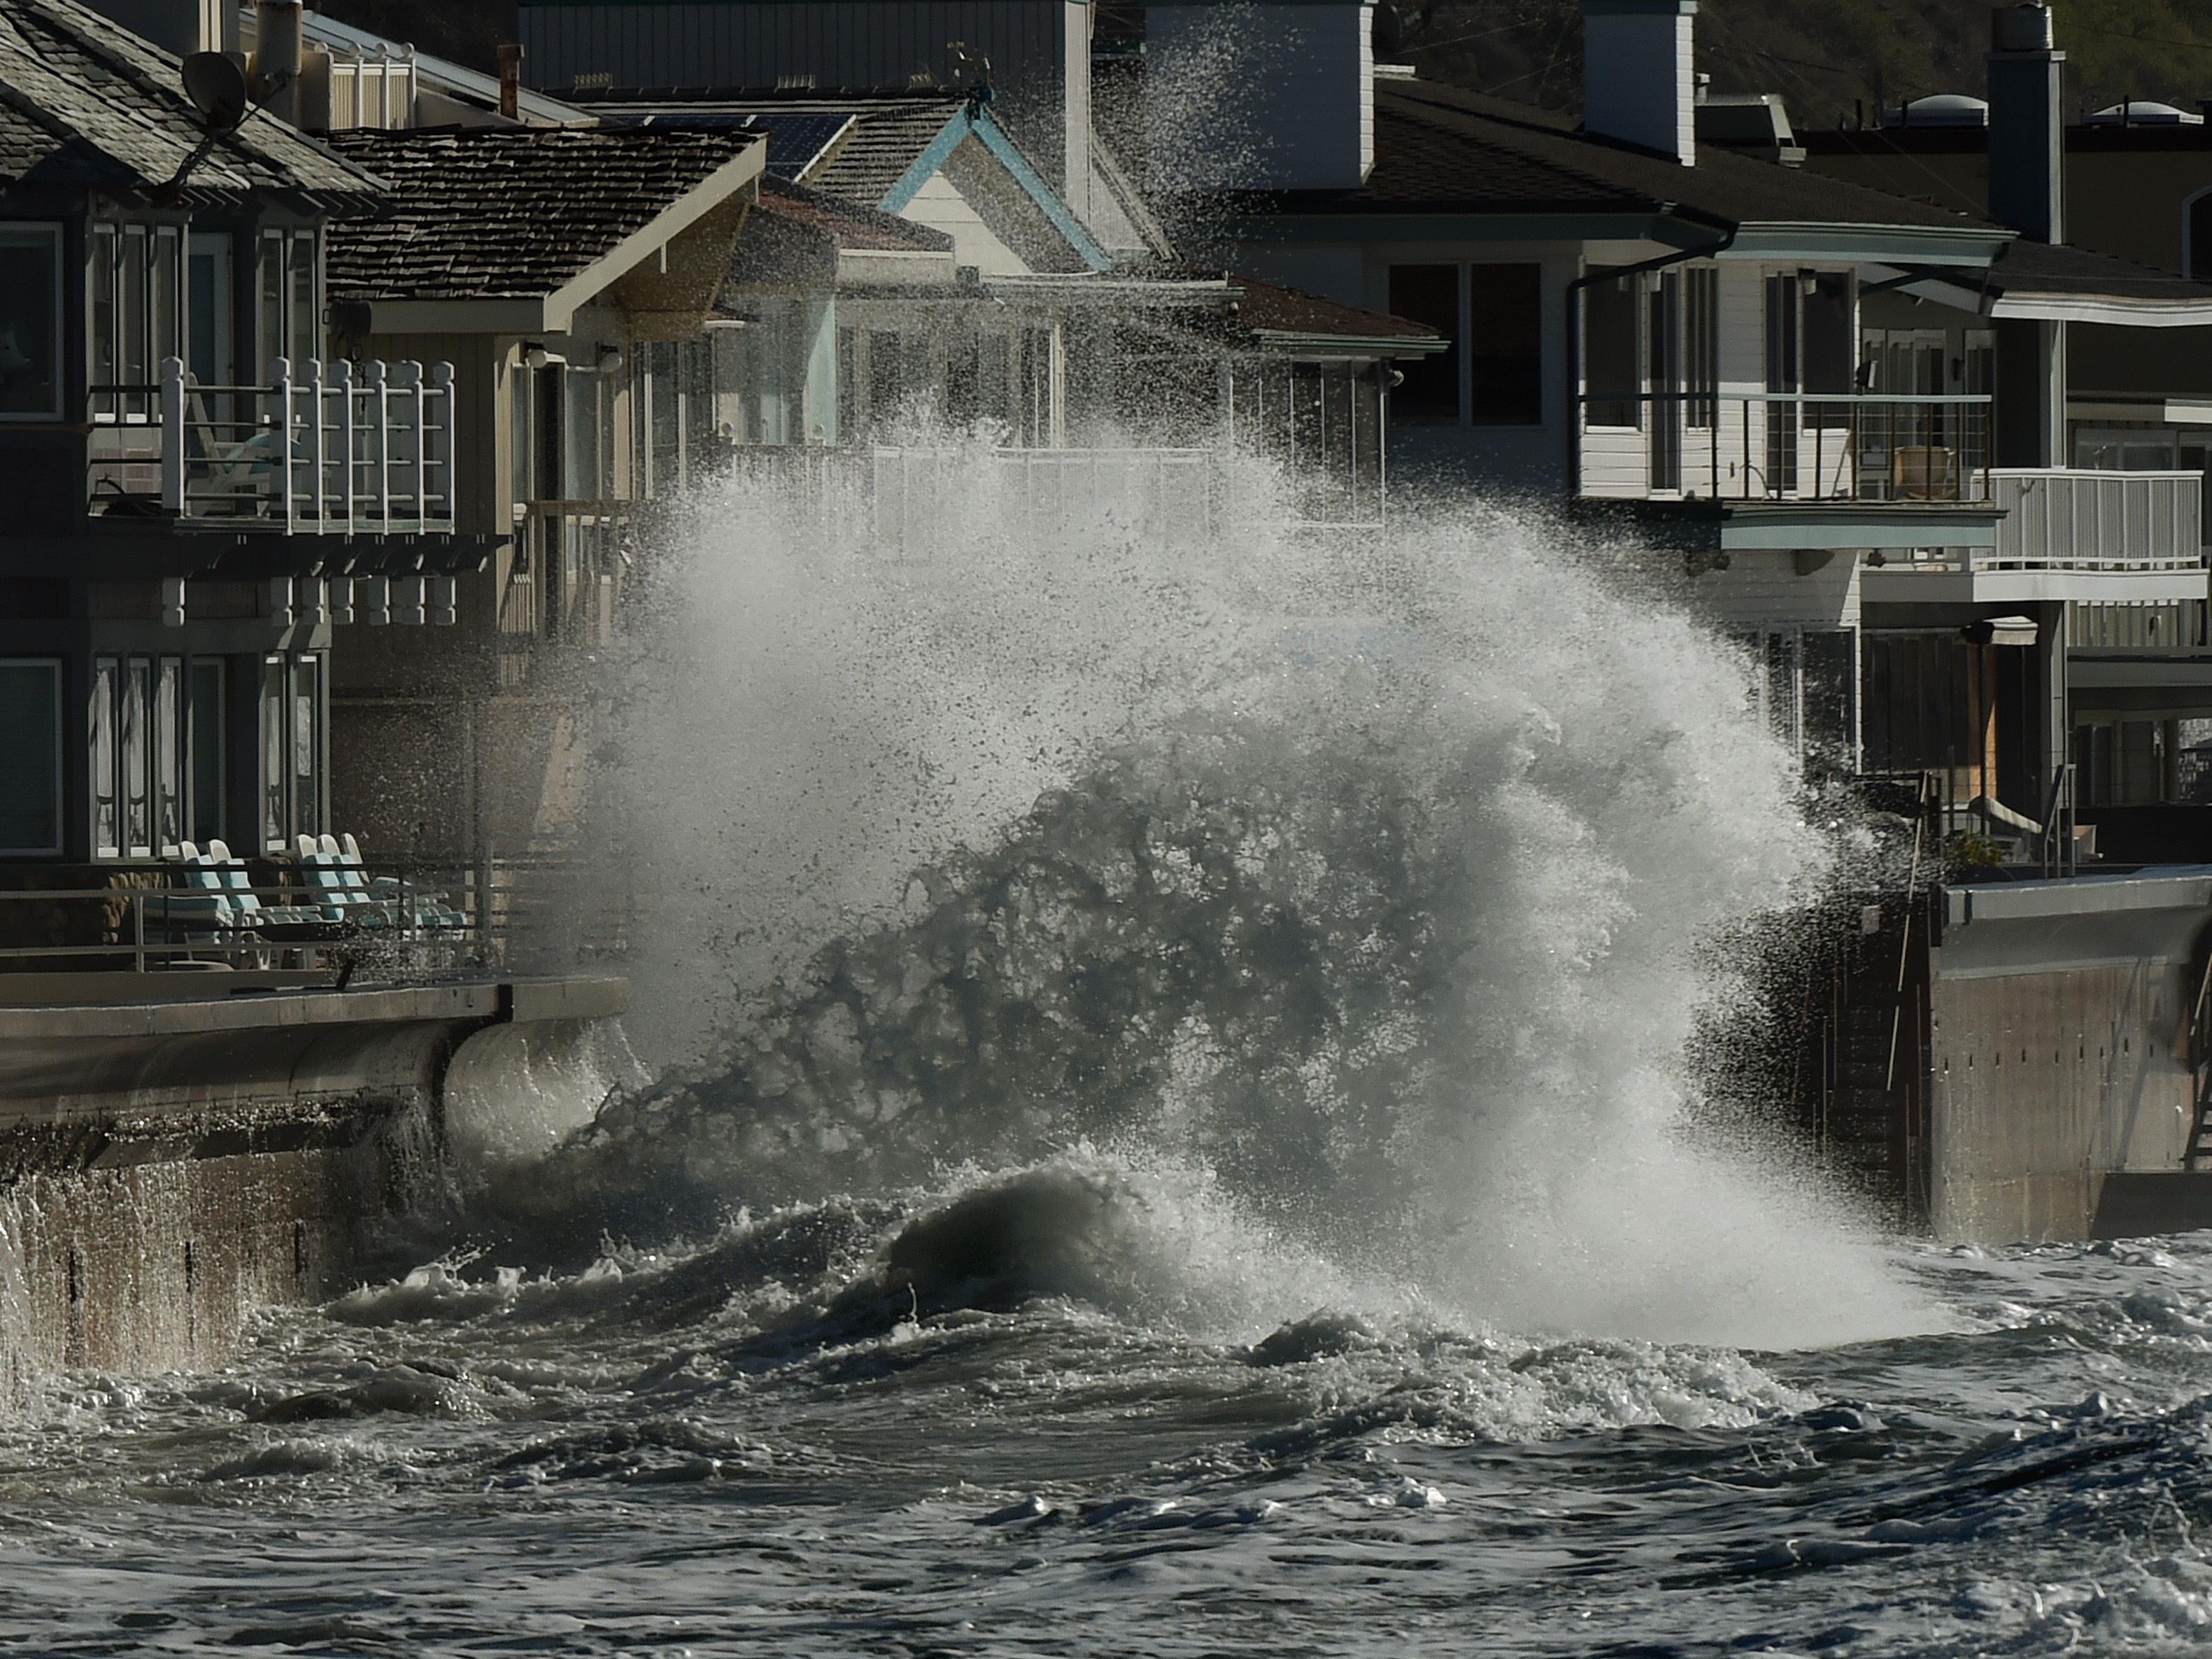 El Nino brachte dürregeplagtem Kalifornien starke Regenfälle.